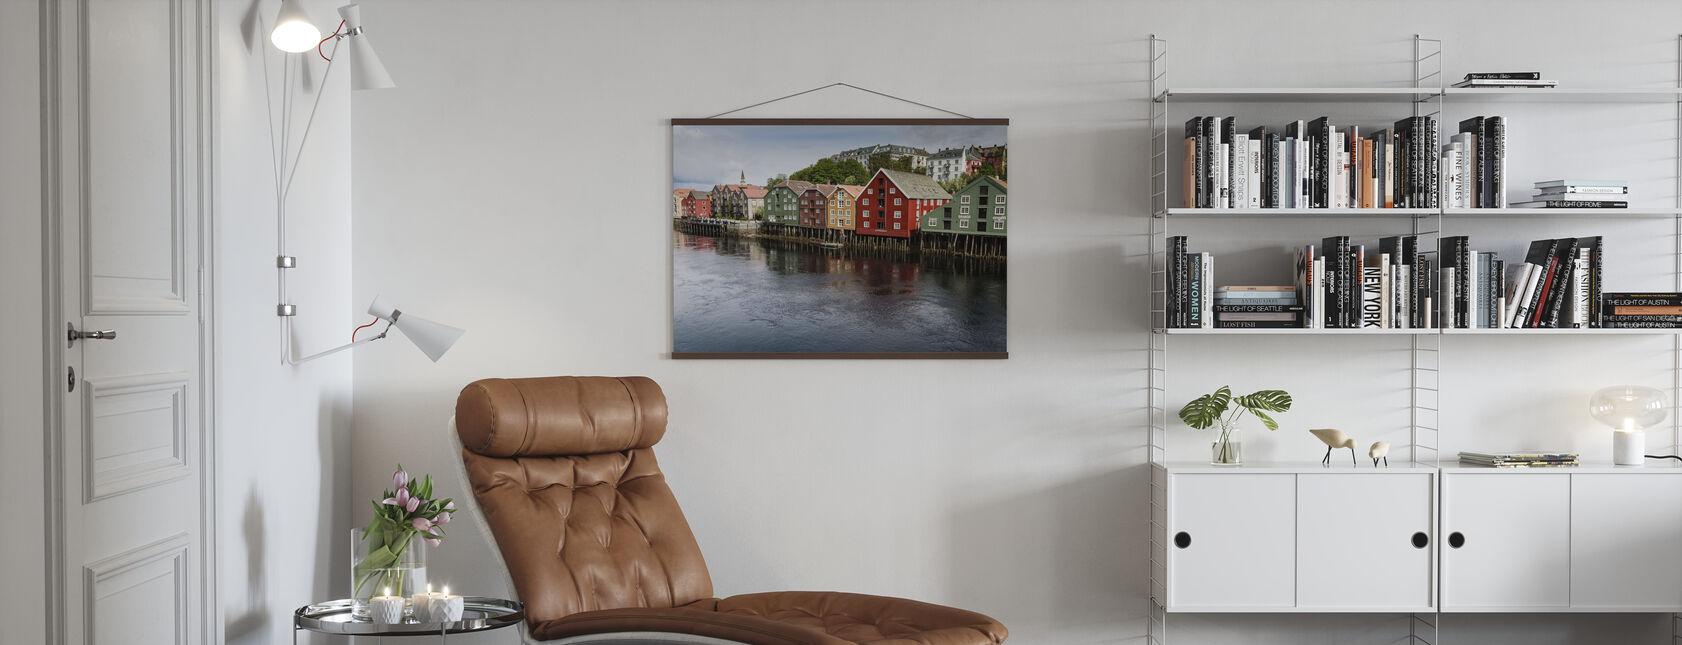 Trondheim - Plakat - Stue